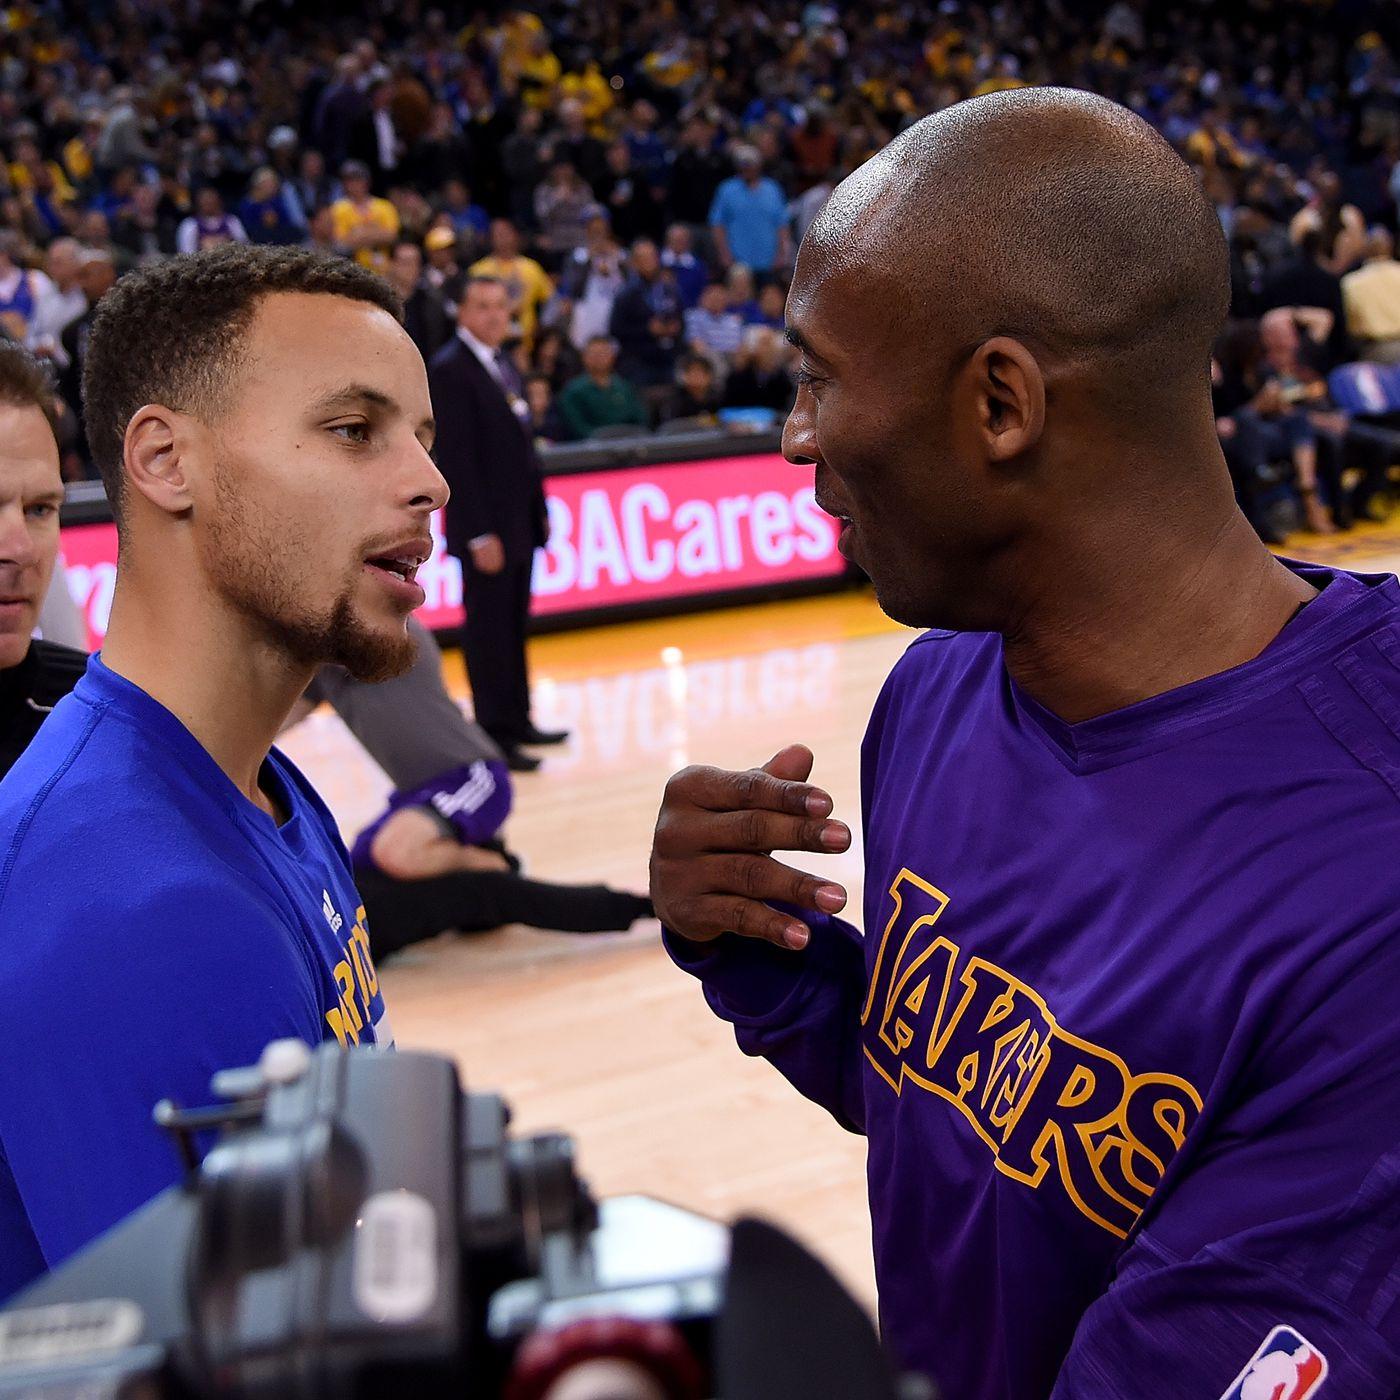 083e9b77dd0e Warriors news  Golden State will watch Kobe Bryant s jersey ...